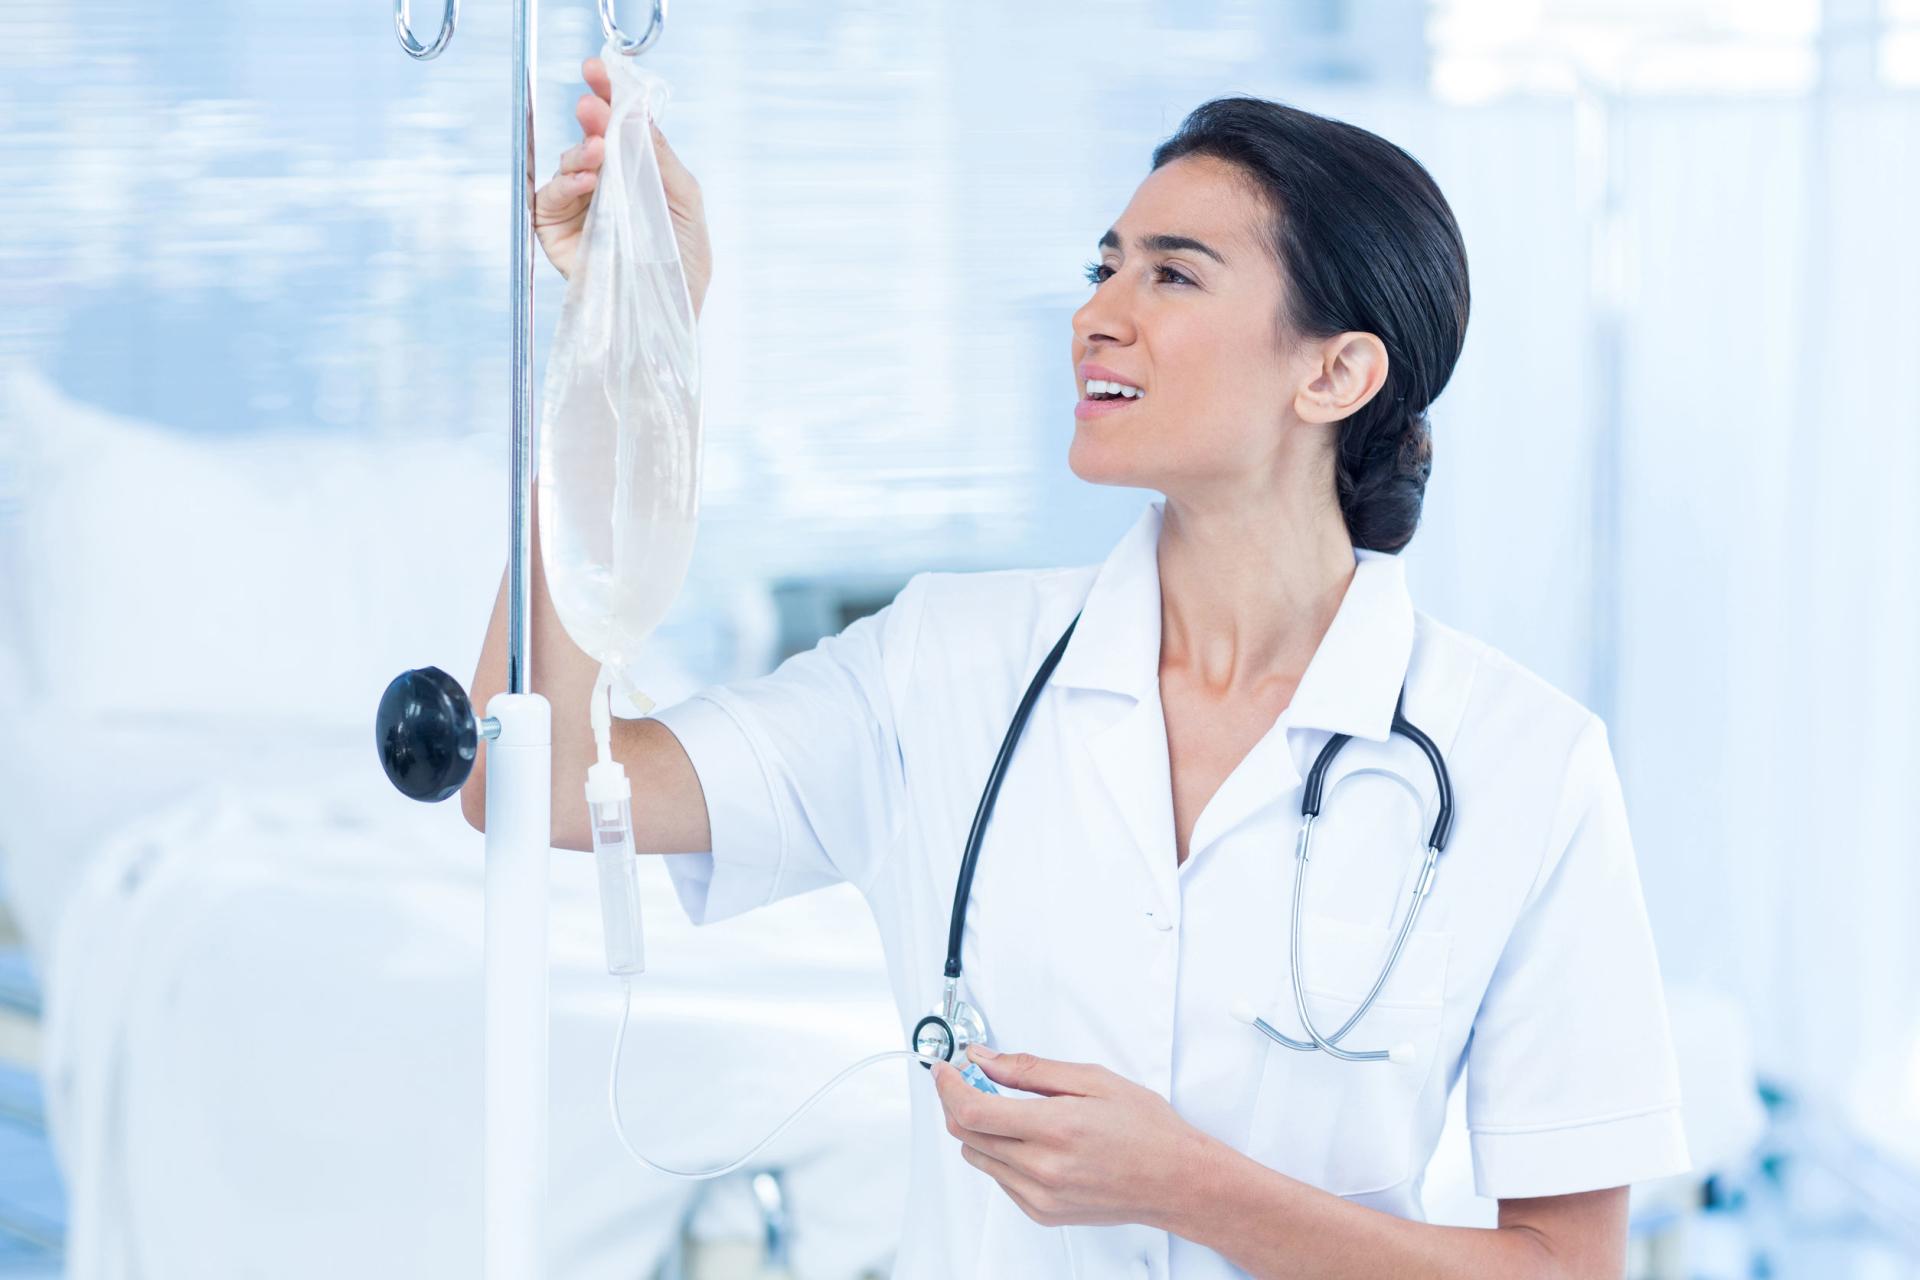 infuustherapie